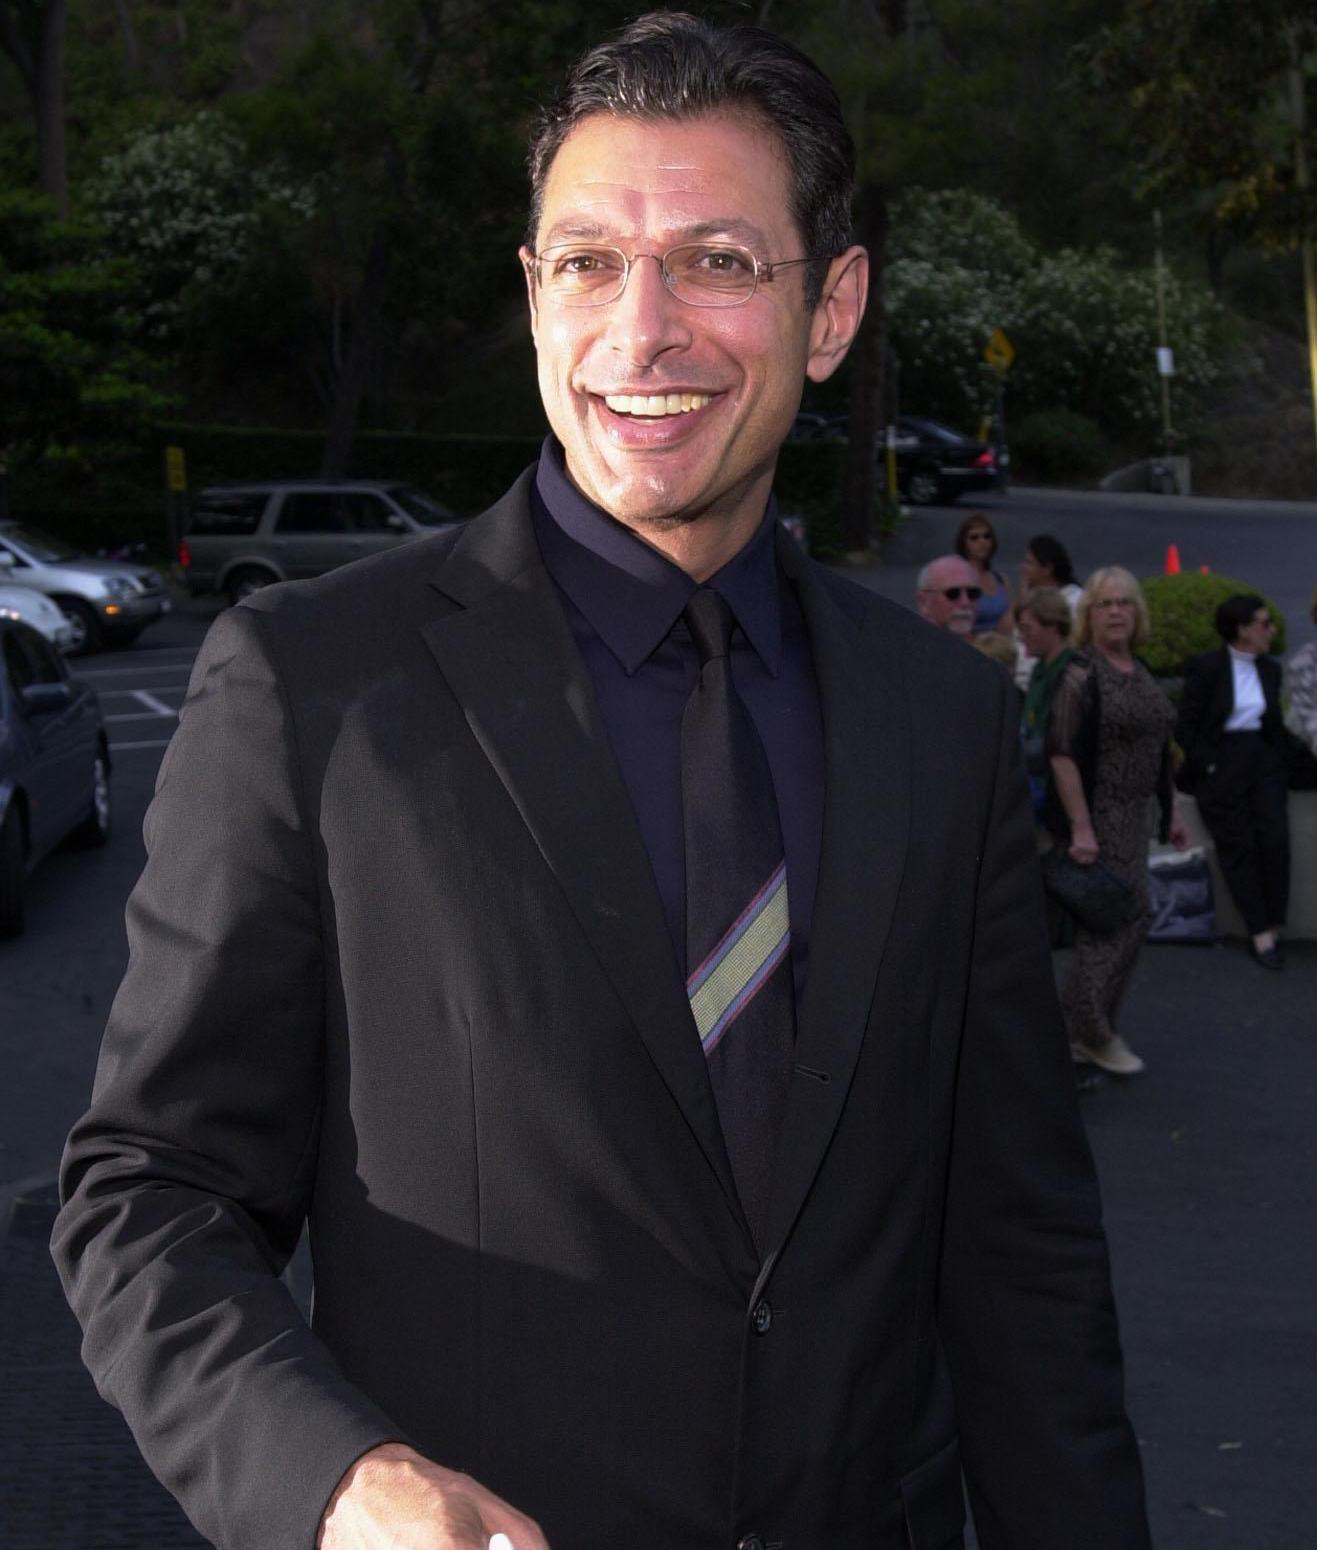 jeffgoldblum 6 10 19 003 20 Things You Never Knew About Jeff Goldblum